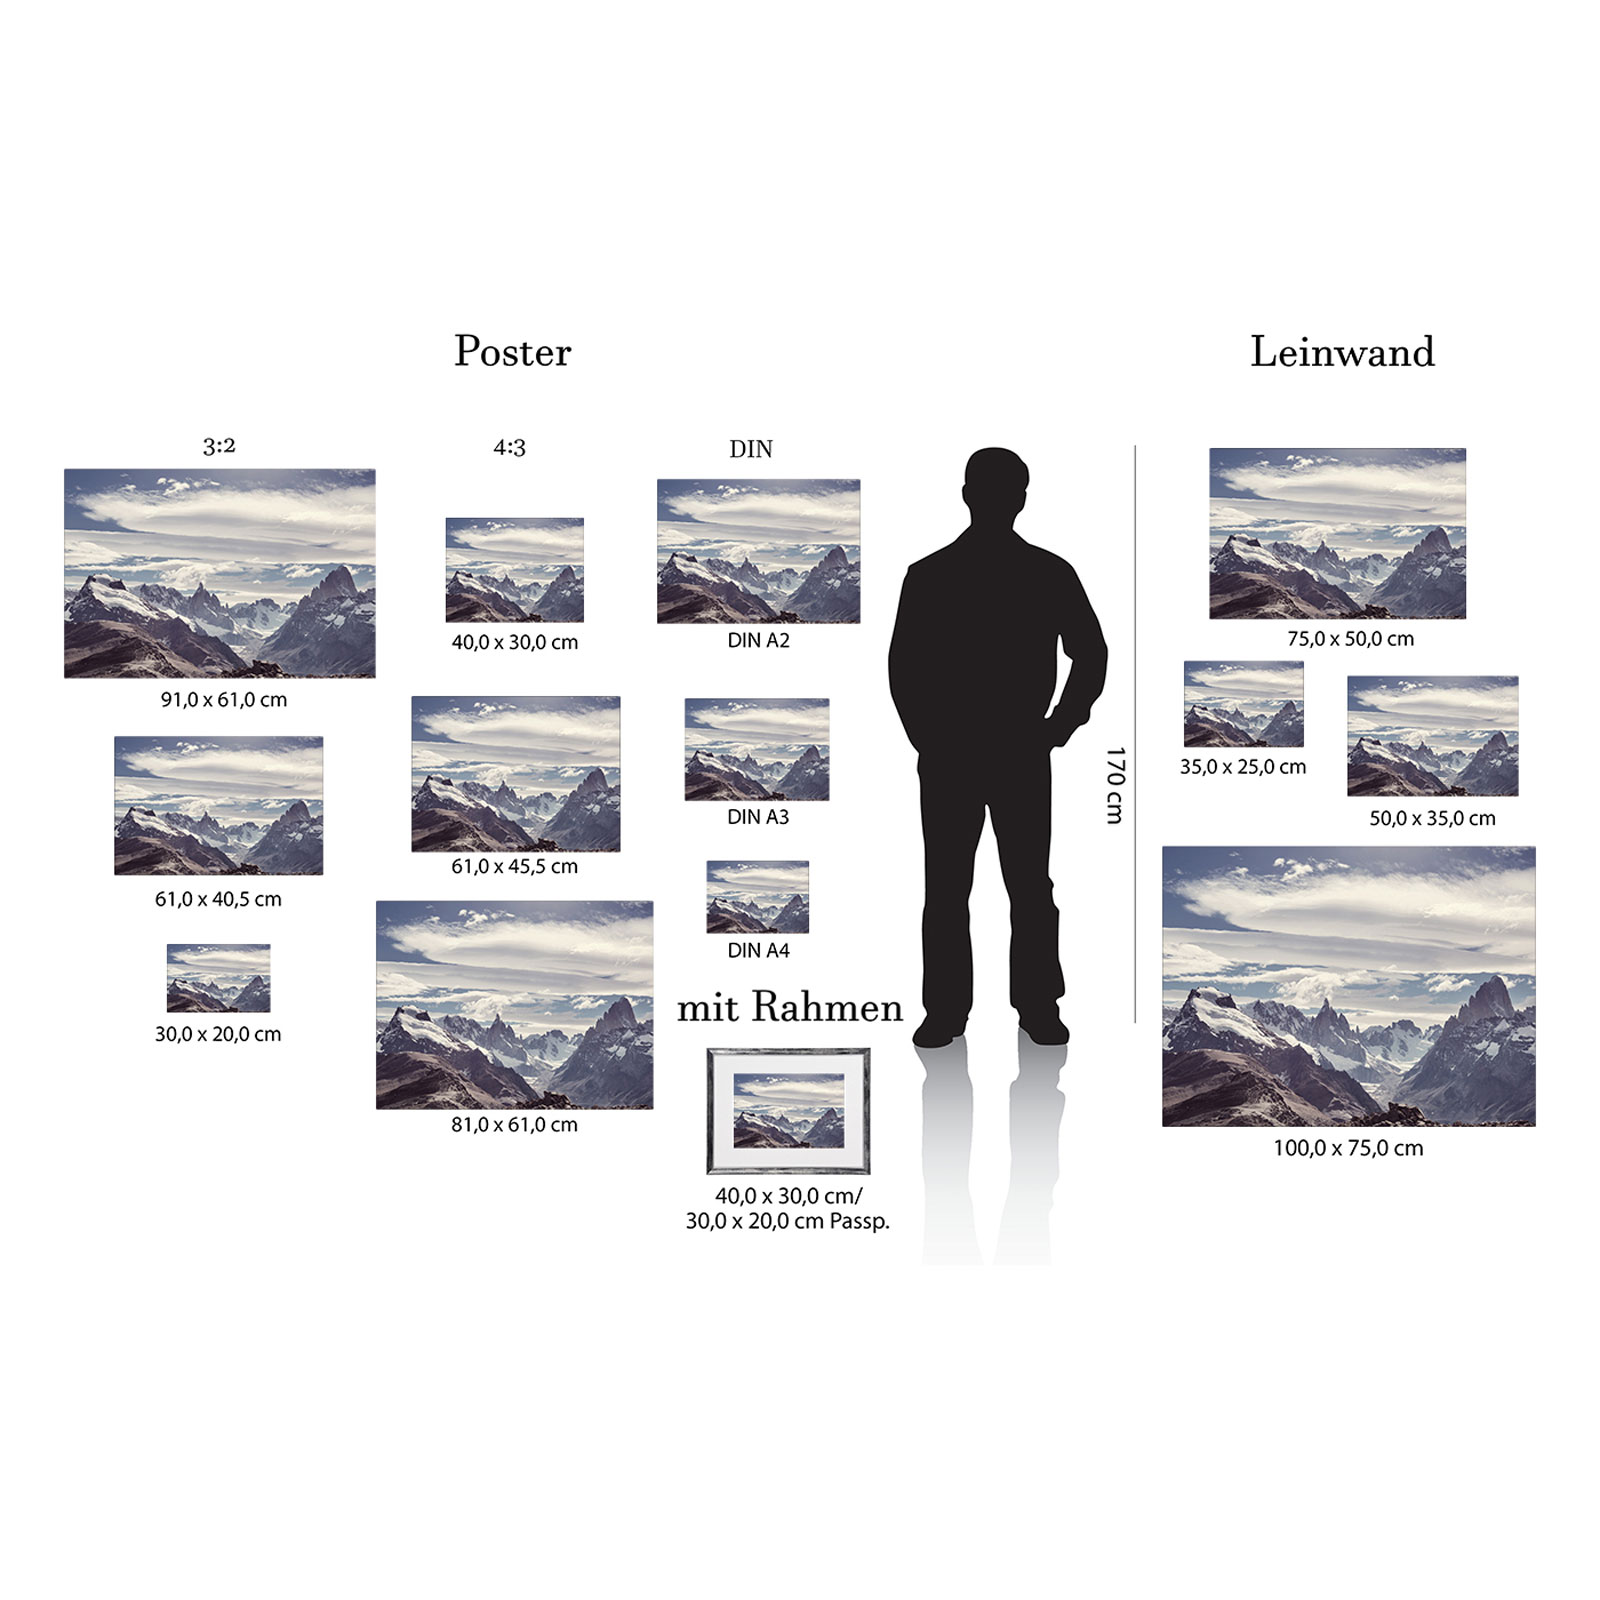 #110732 30x20cm Kniende Halbnackte Frau Poster Leinwand-Druck Egon Schiele